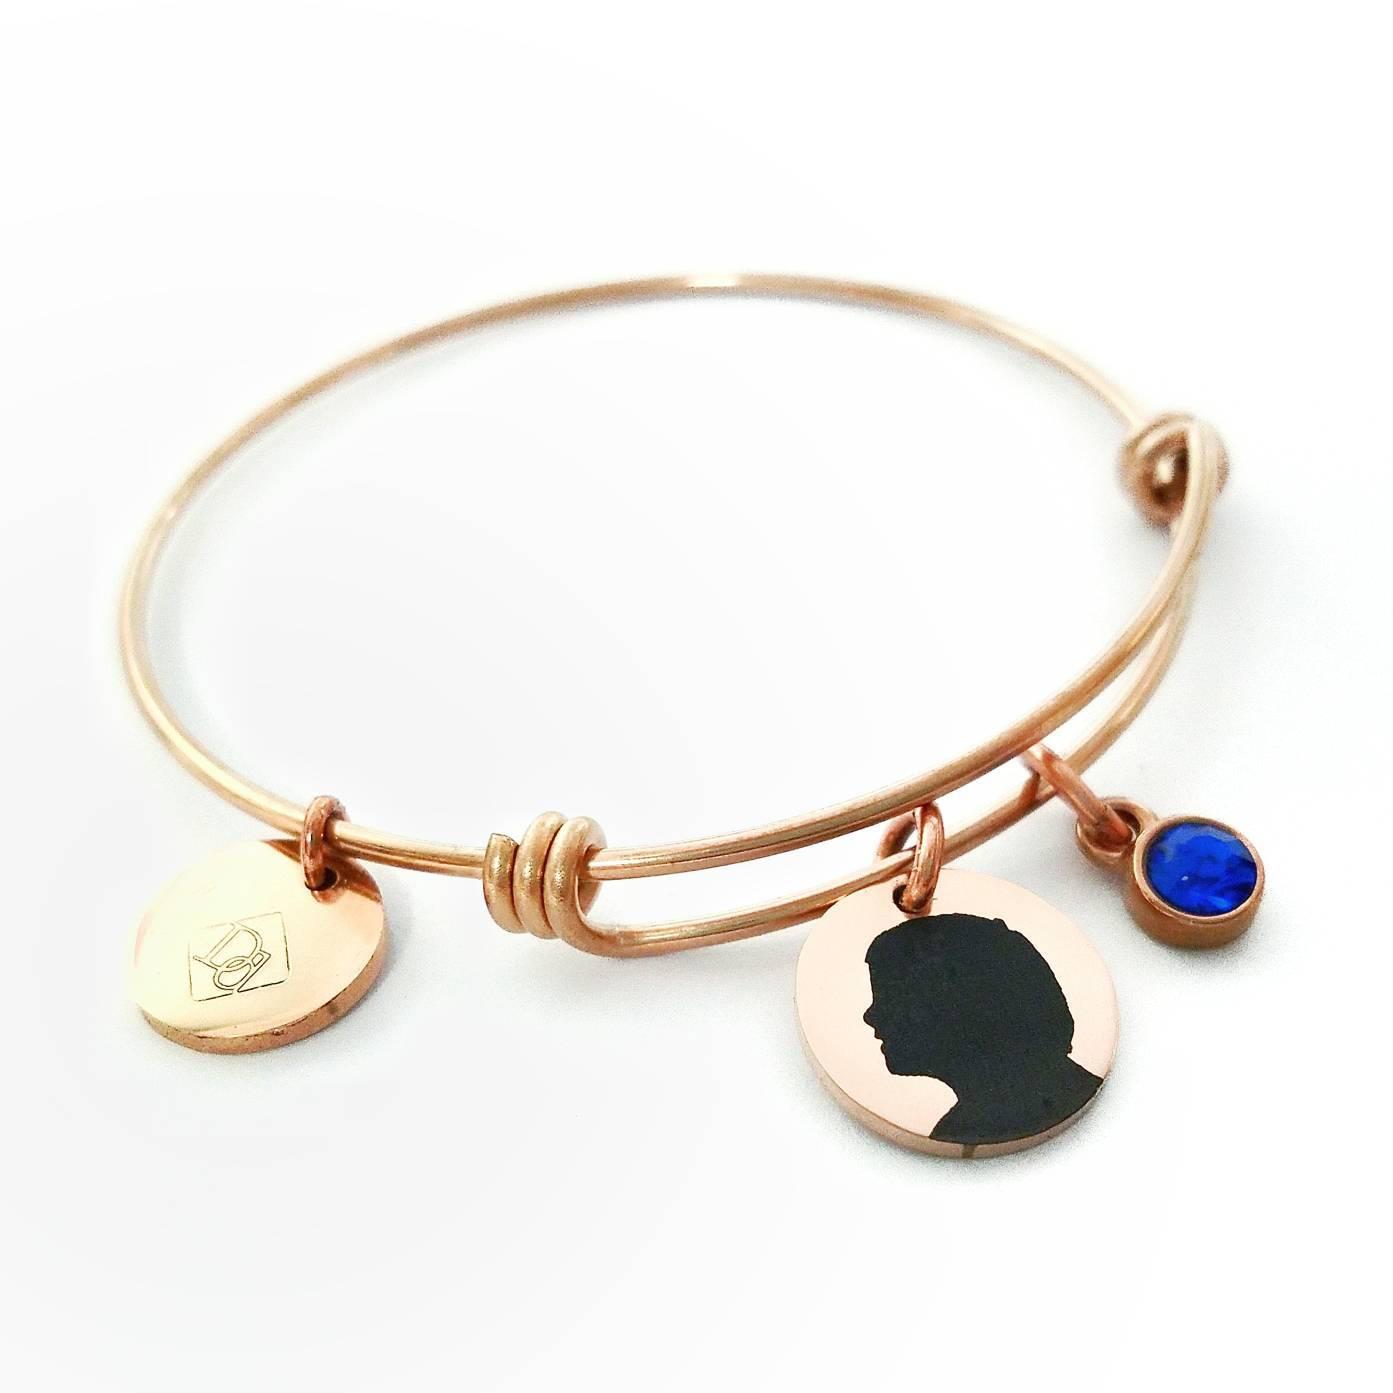 1393x1393 Mom Bangle Mother Bracelet Silhouette Charm Bracelet